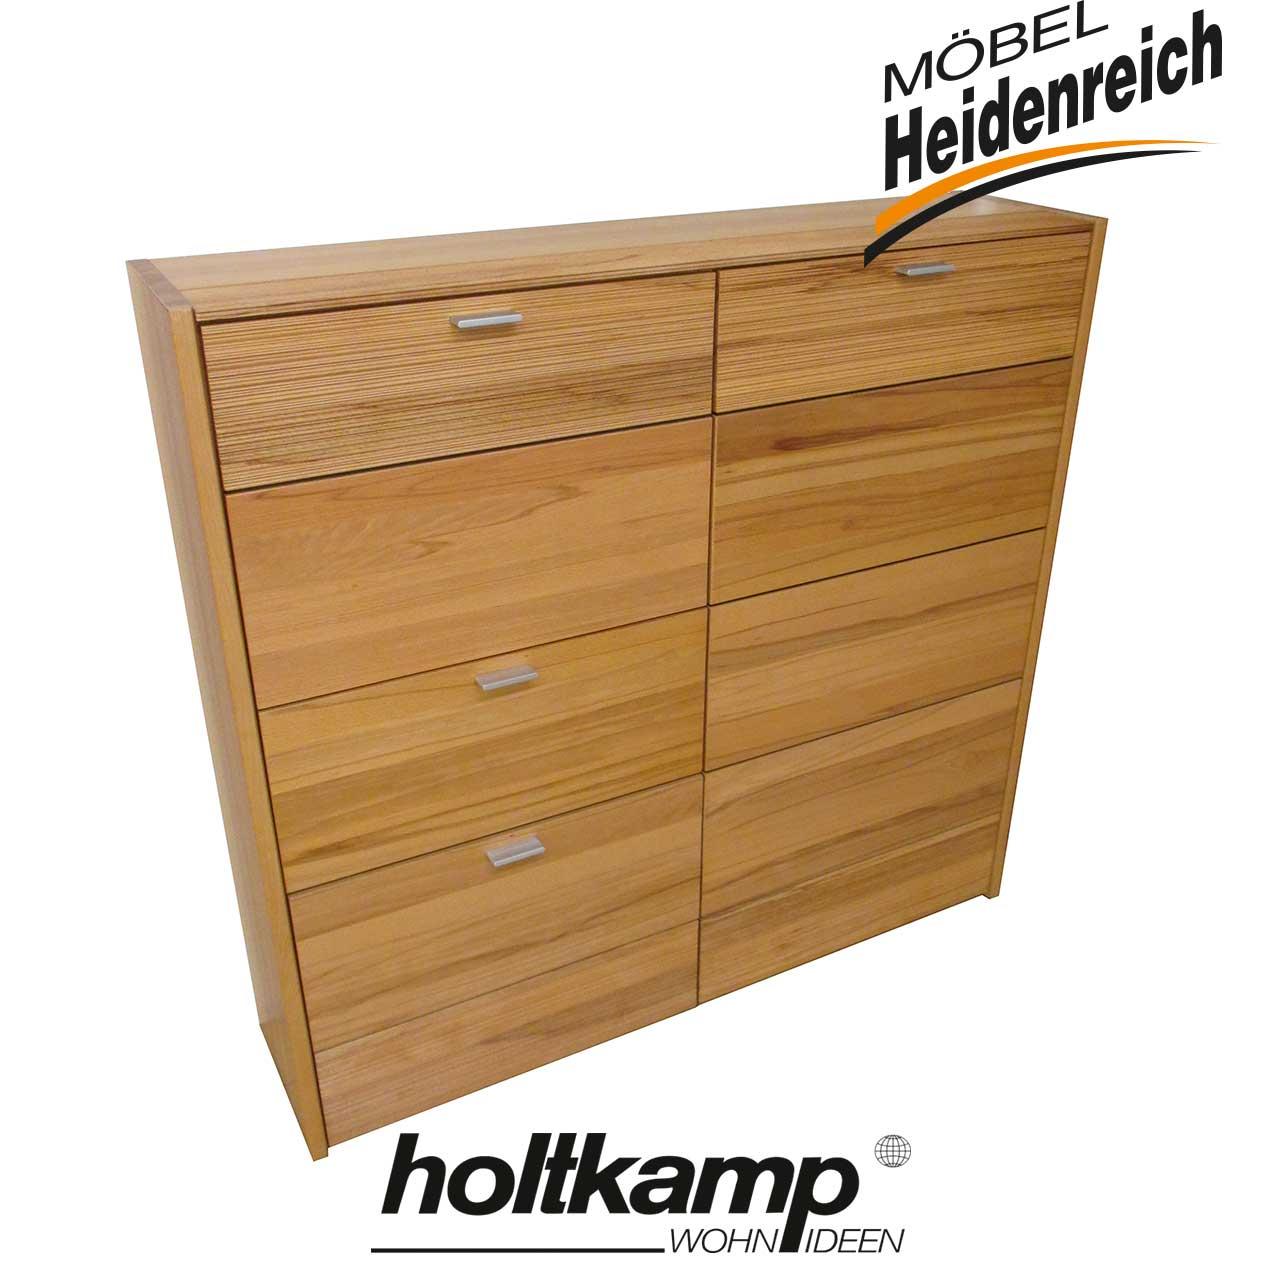 Holtkamp schuhschrank estada schuhschr nke sale for Schuhschrank sale